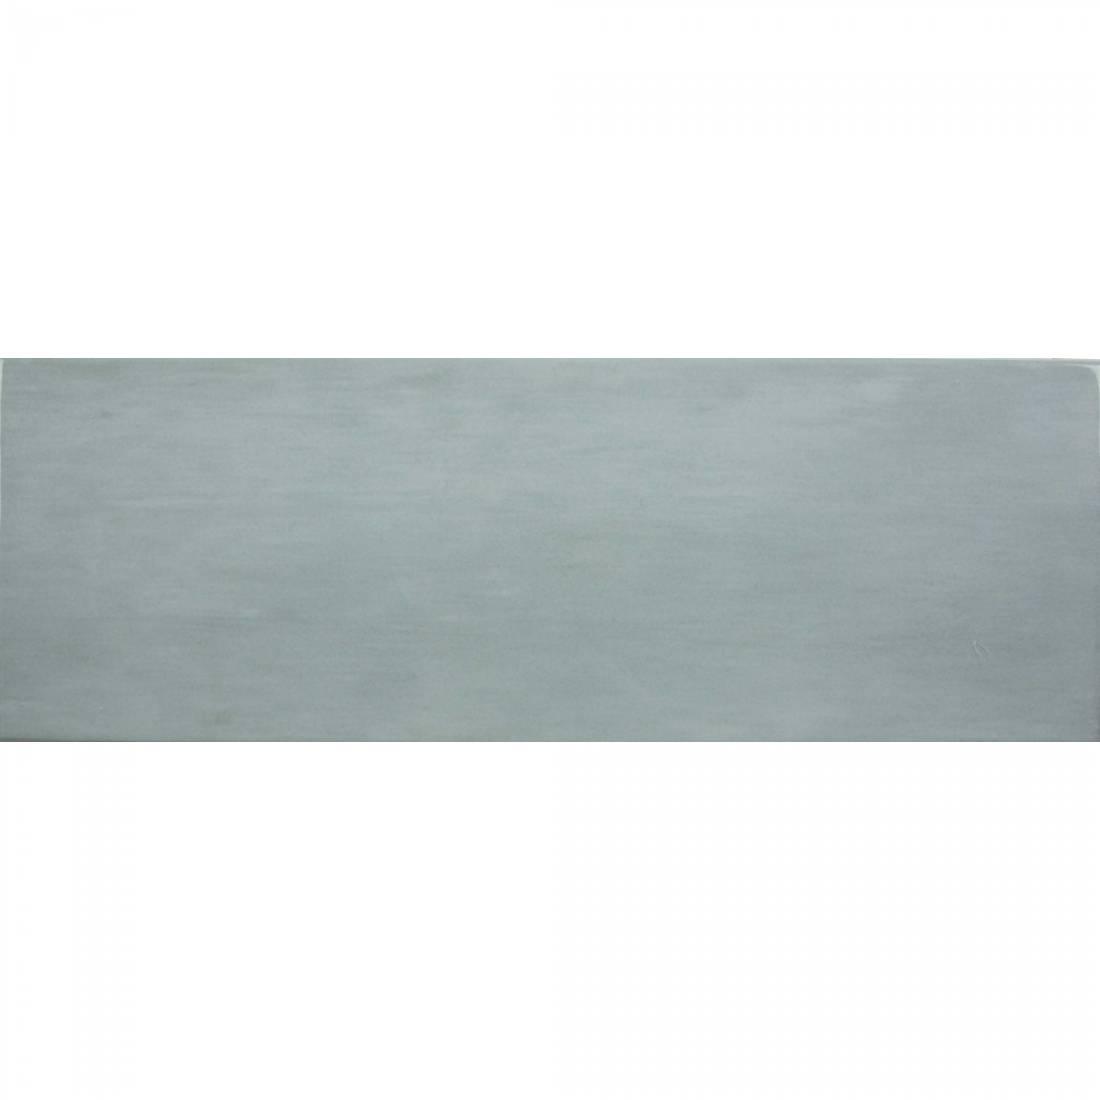 Arlette 21.4x61 Aqua Gloss 1